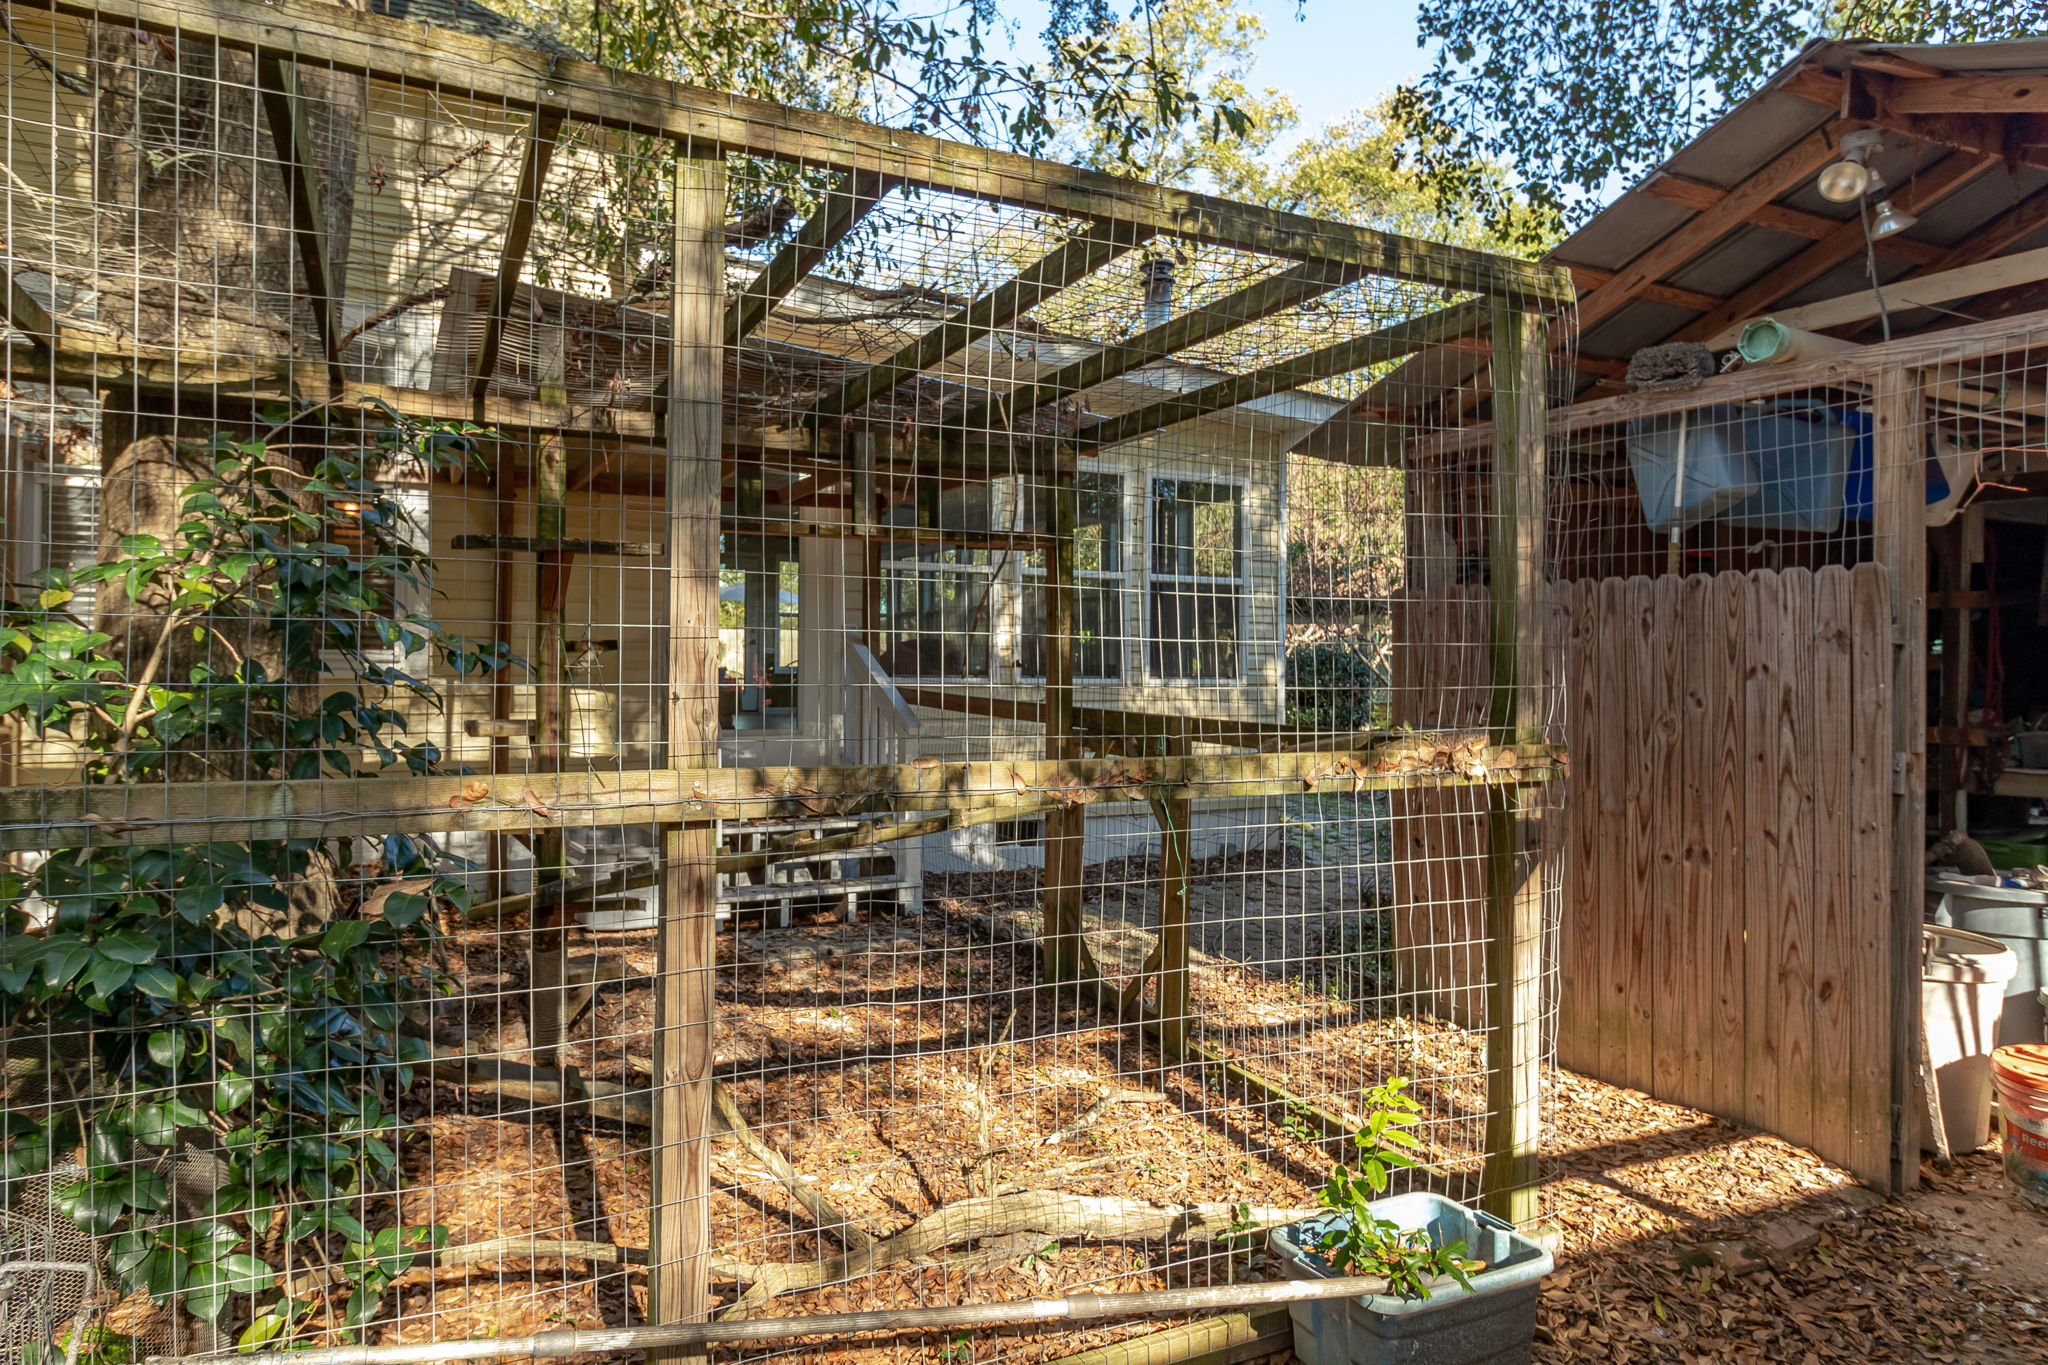 Cattery - Chicken Coop